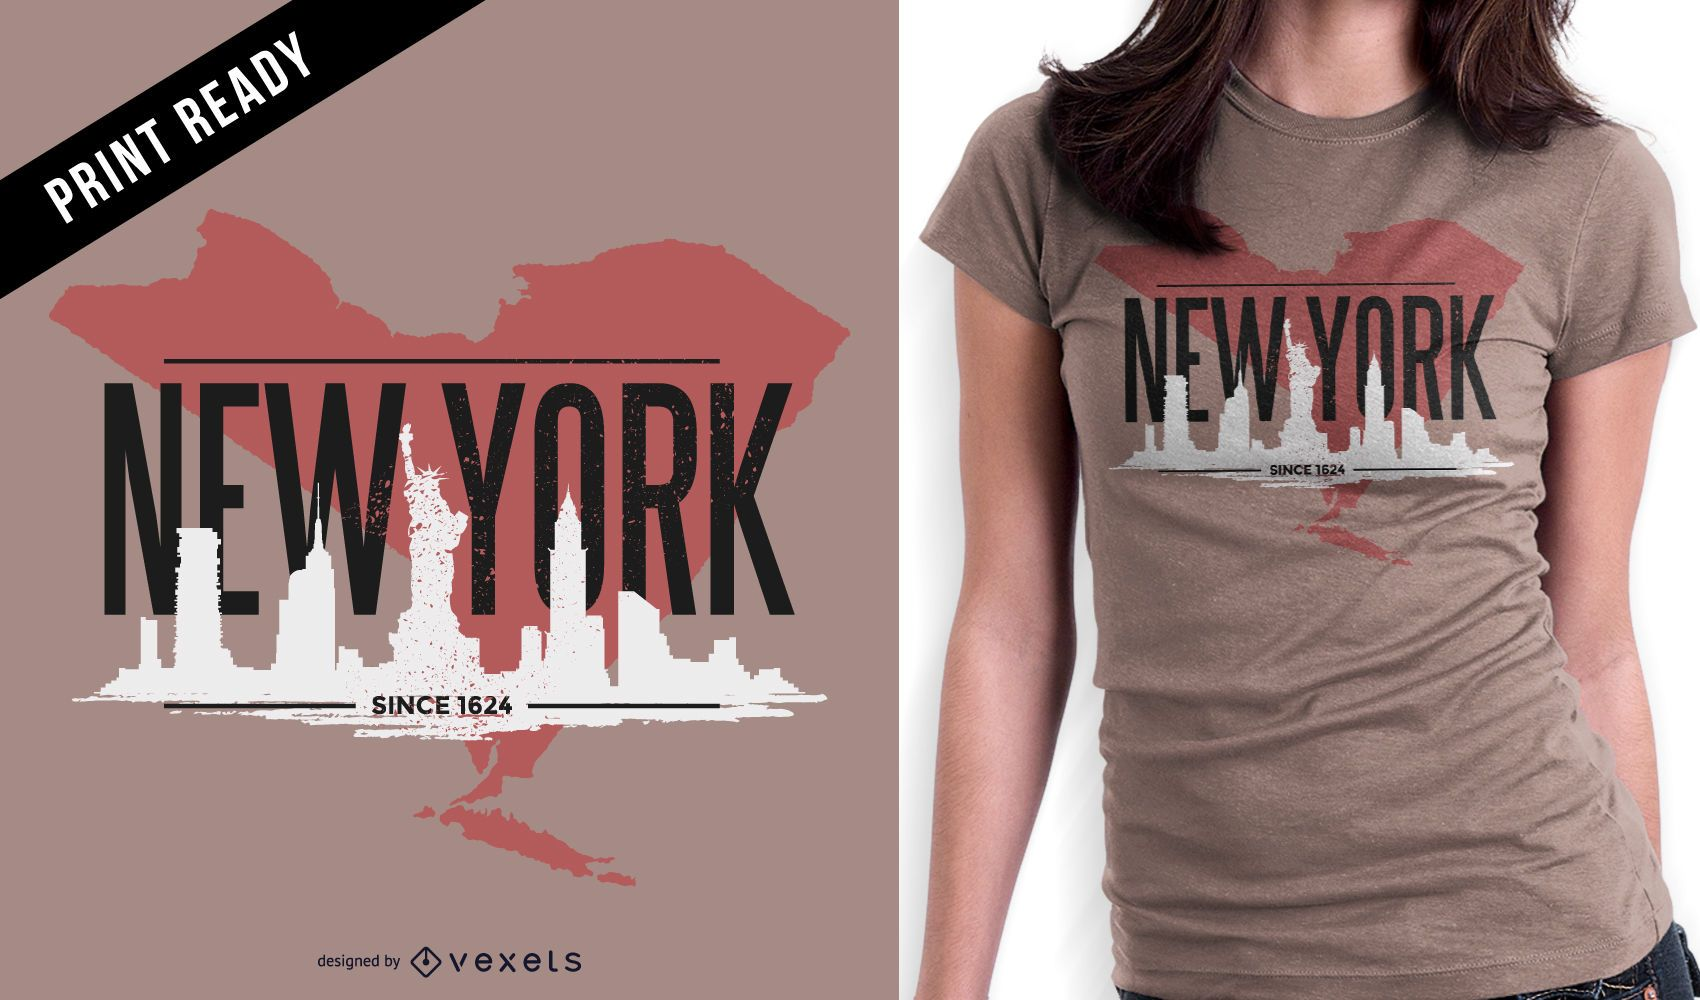 New York rugged t-shirt design